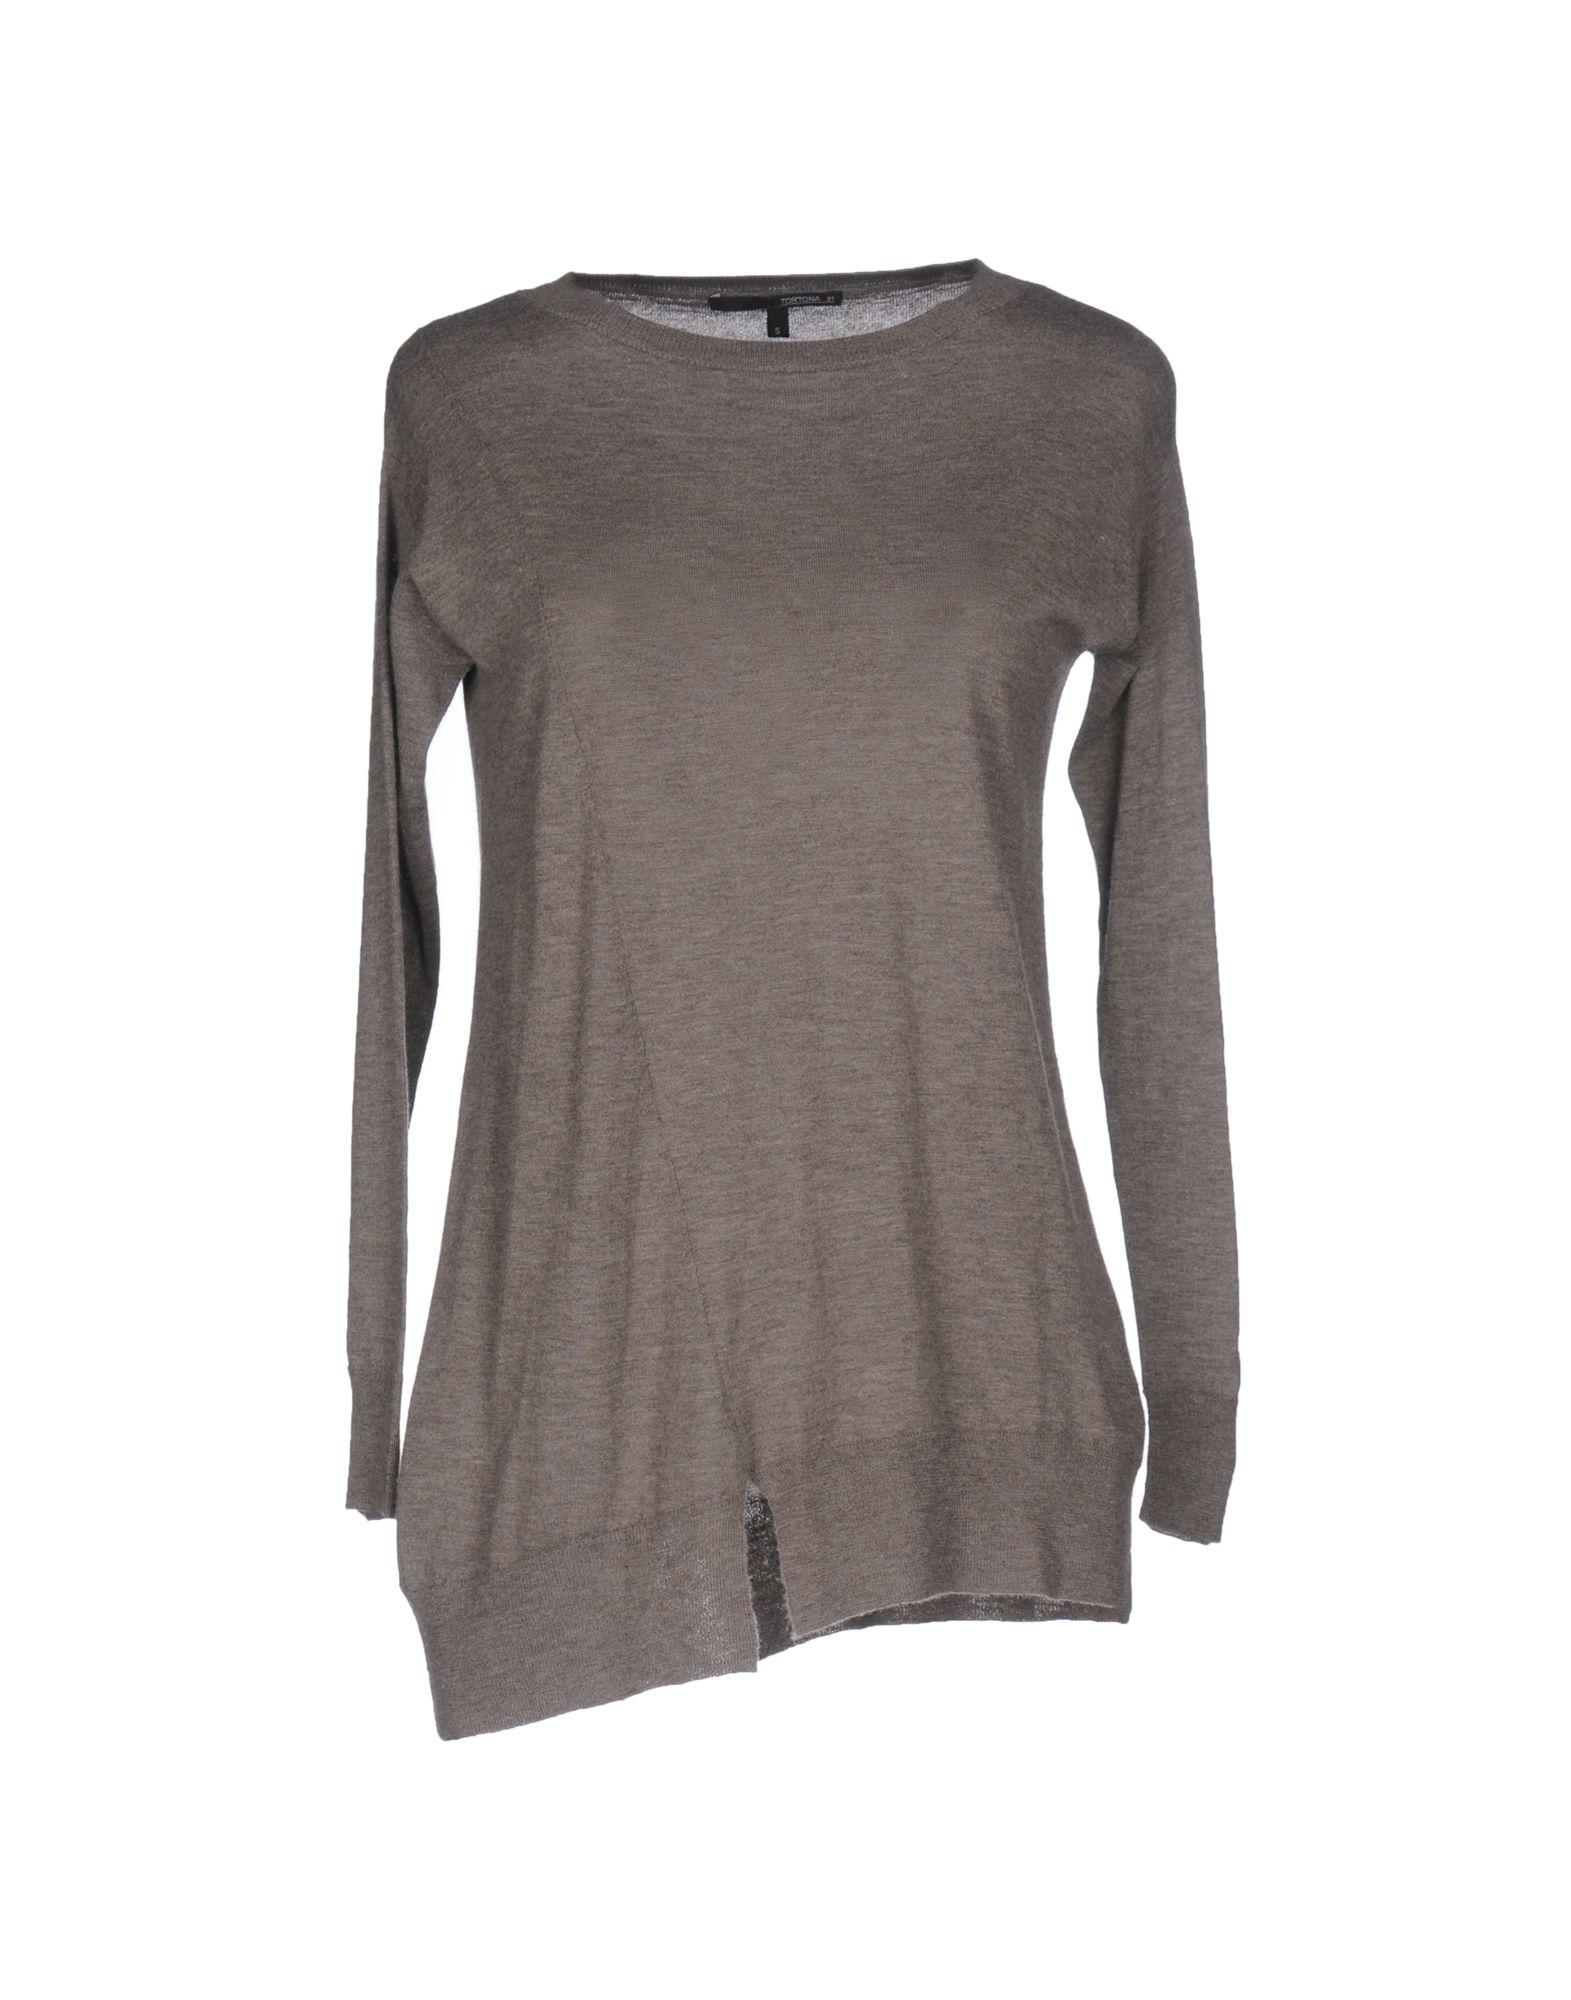 TORTONA 21 Damen Pullover Farbe Grau Größe 7 - broschei